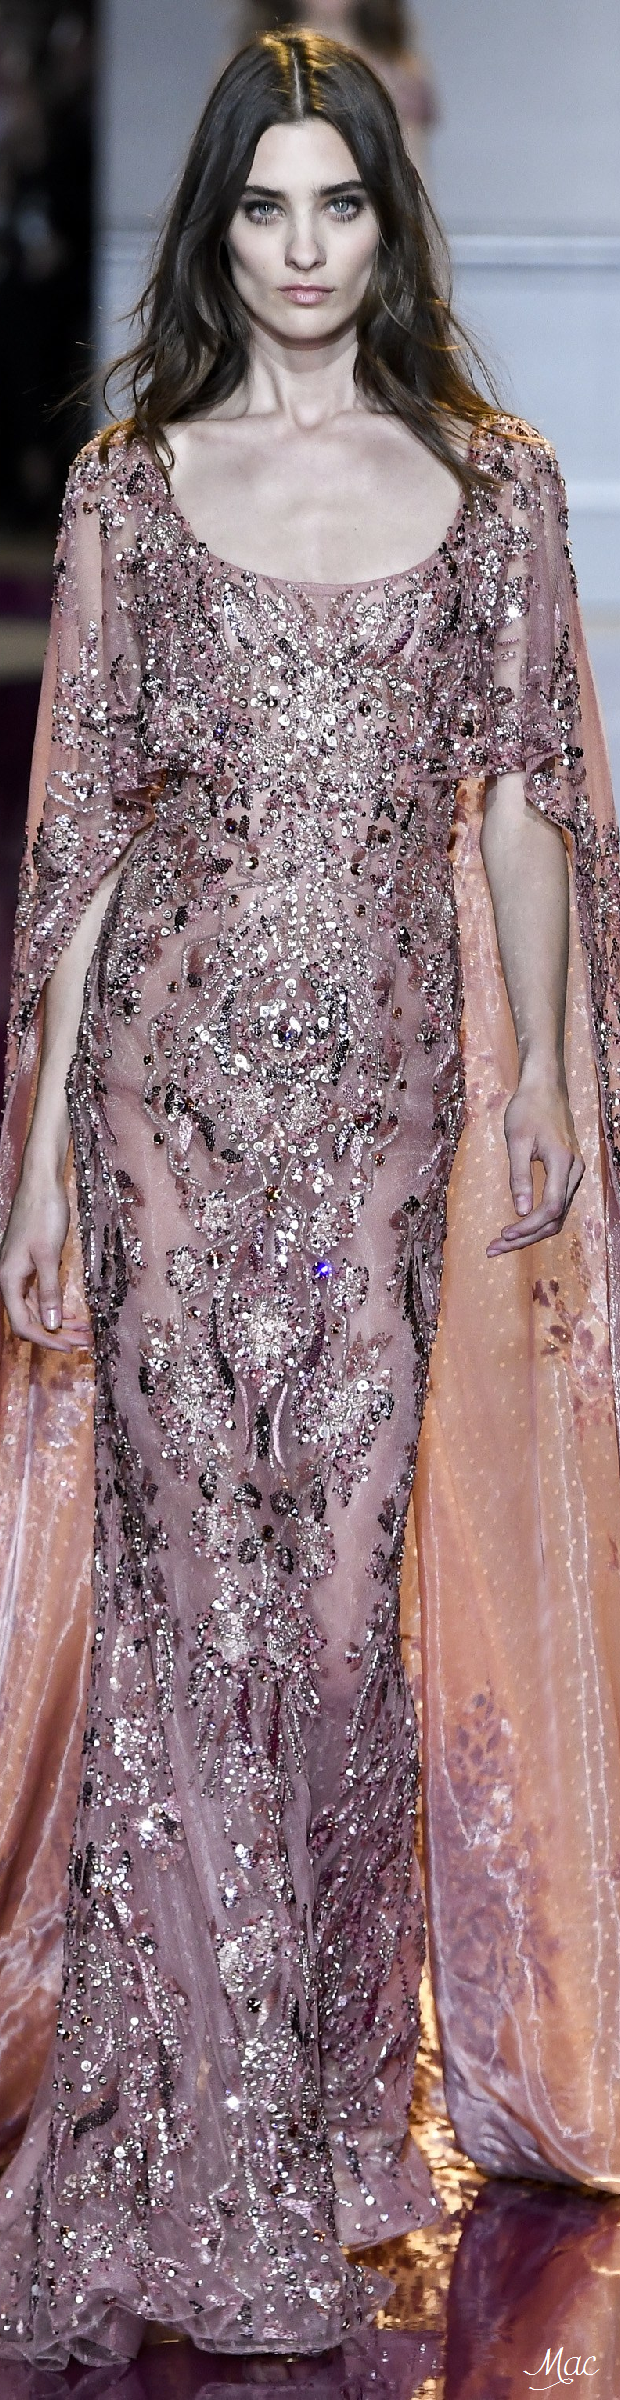 Zuhair Murad Fall 2016 Haute Couture